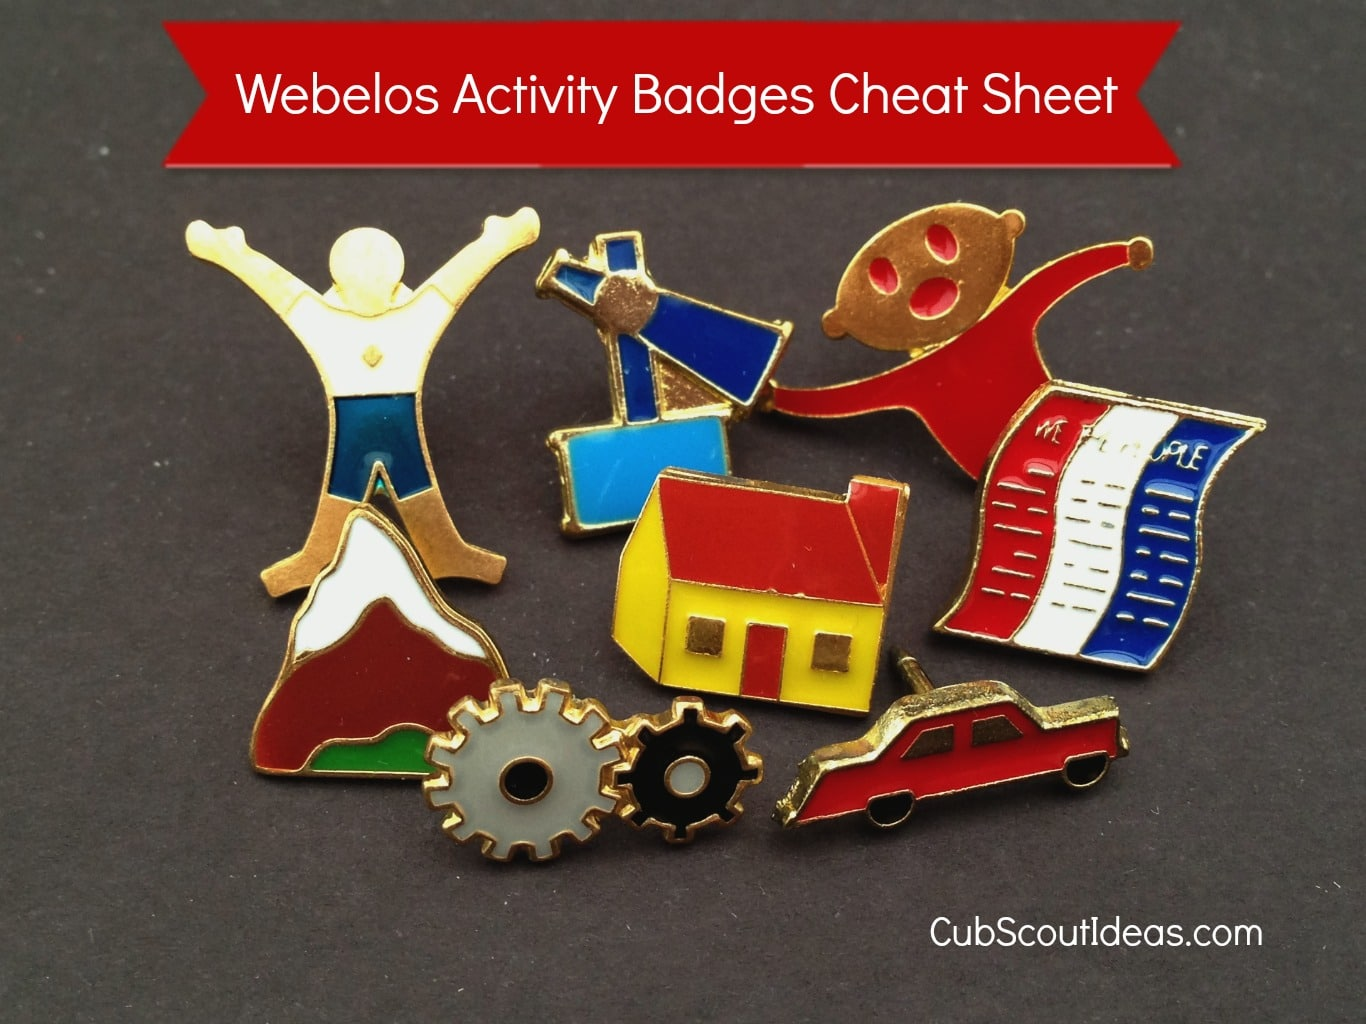 webelos badge worksheet completed pictures to pin on pinterest pinsdaddy. Black Bedroom Furniture Sets. Home Design Ideas